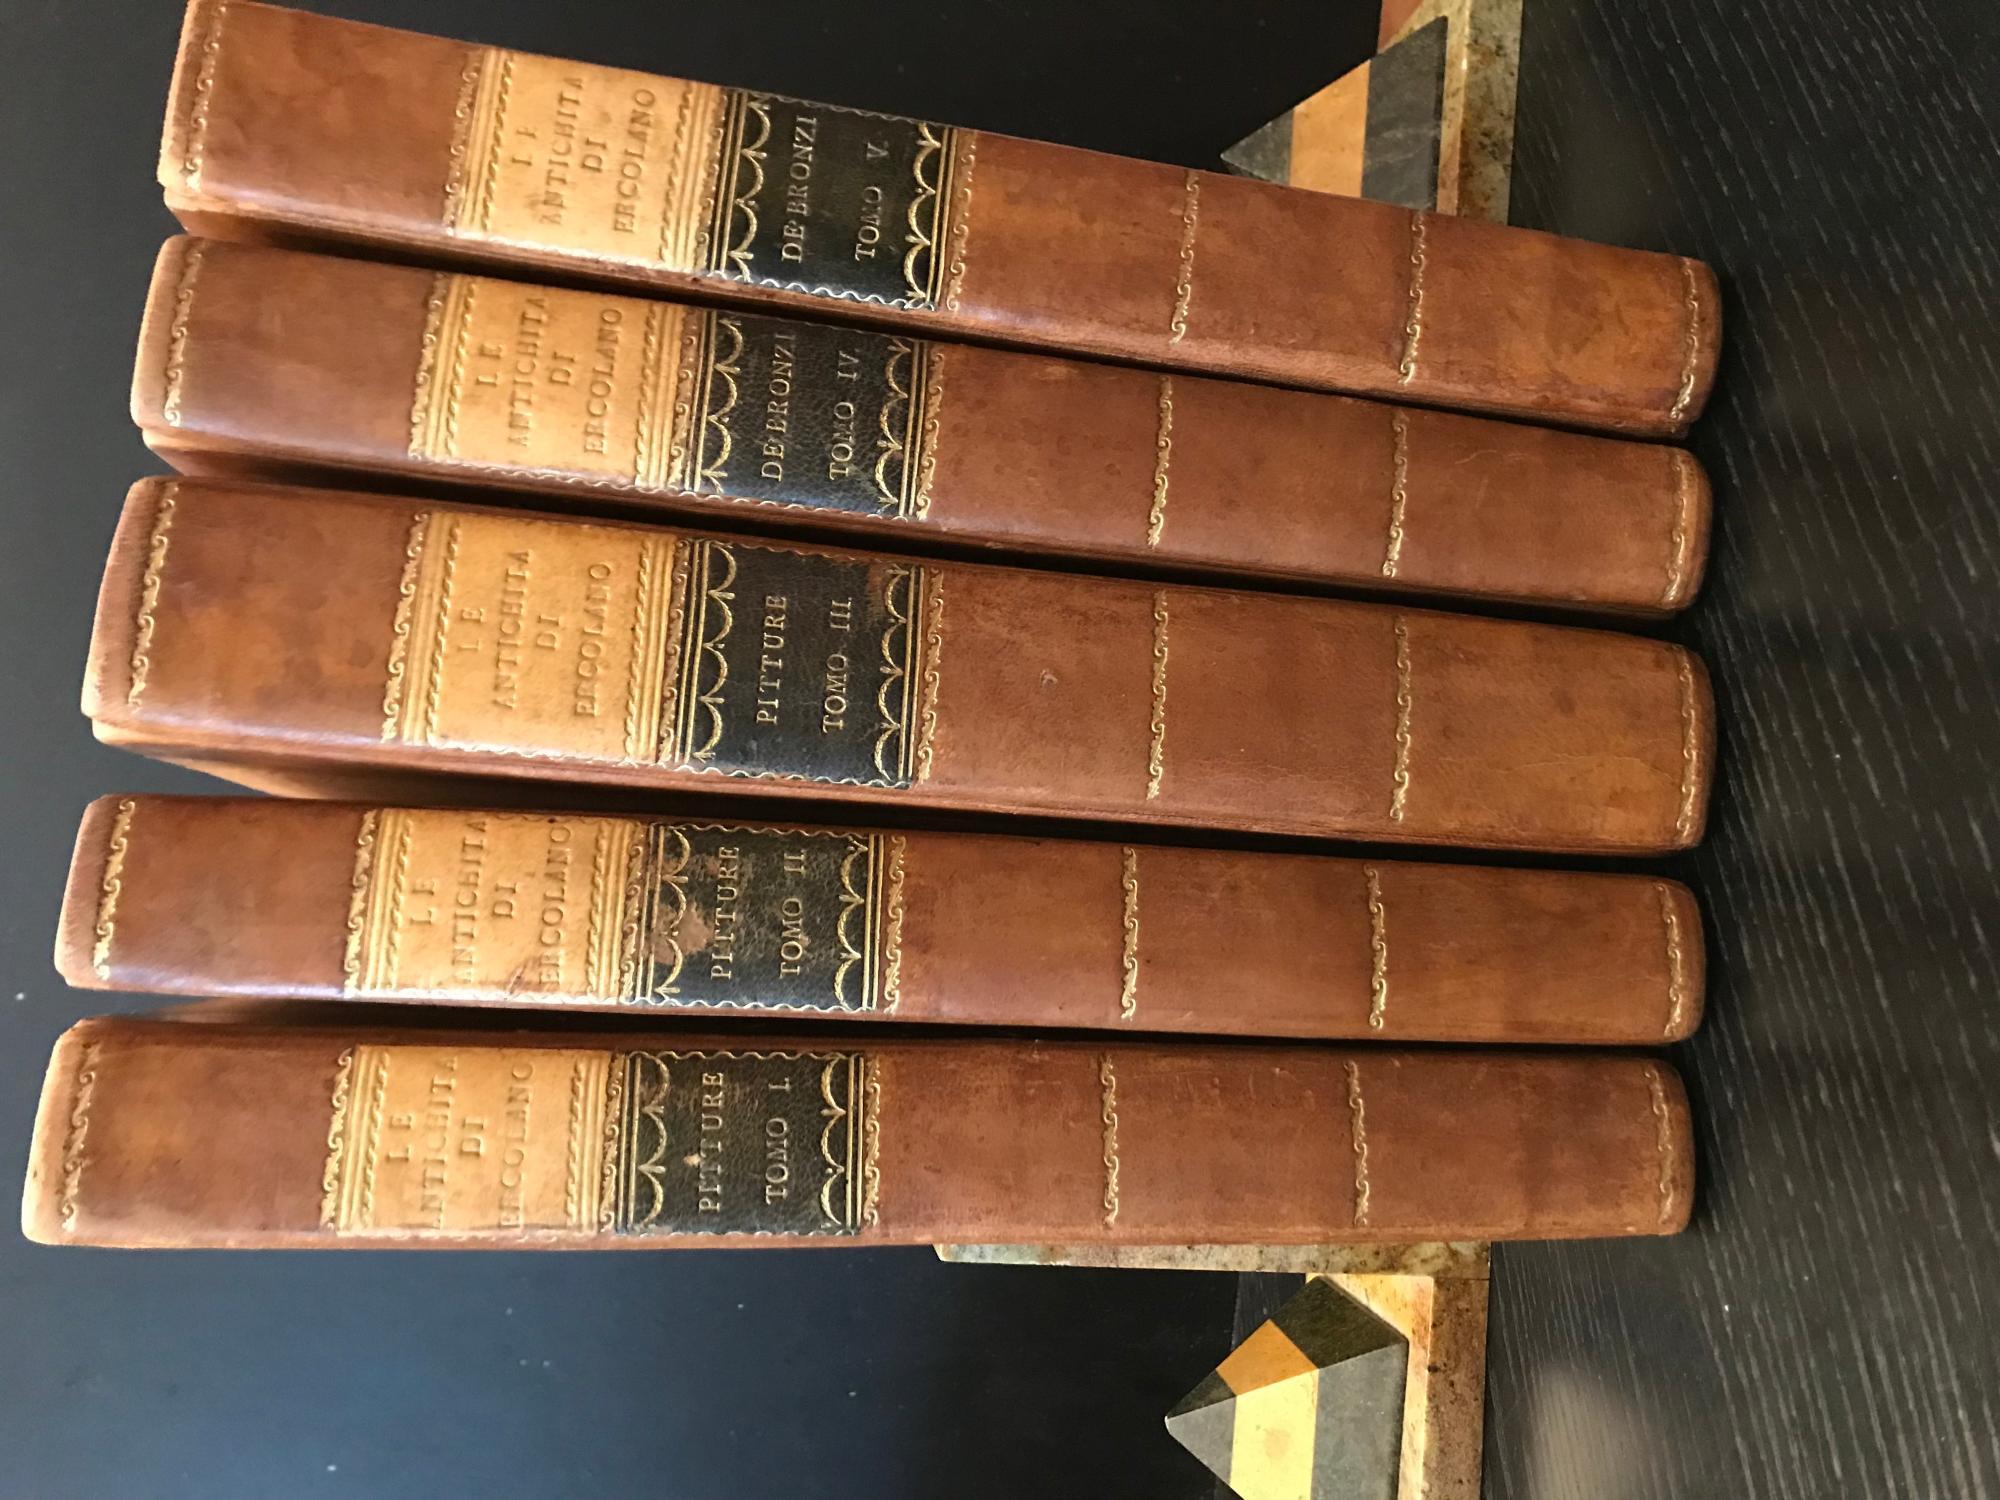 Candelabri Maison Du Monde vialibri ~ rare books from 1794 - page 26